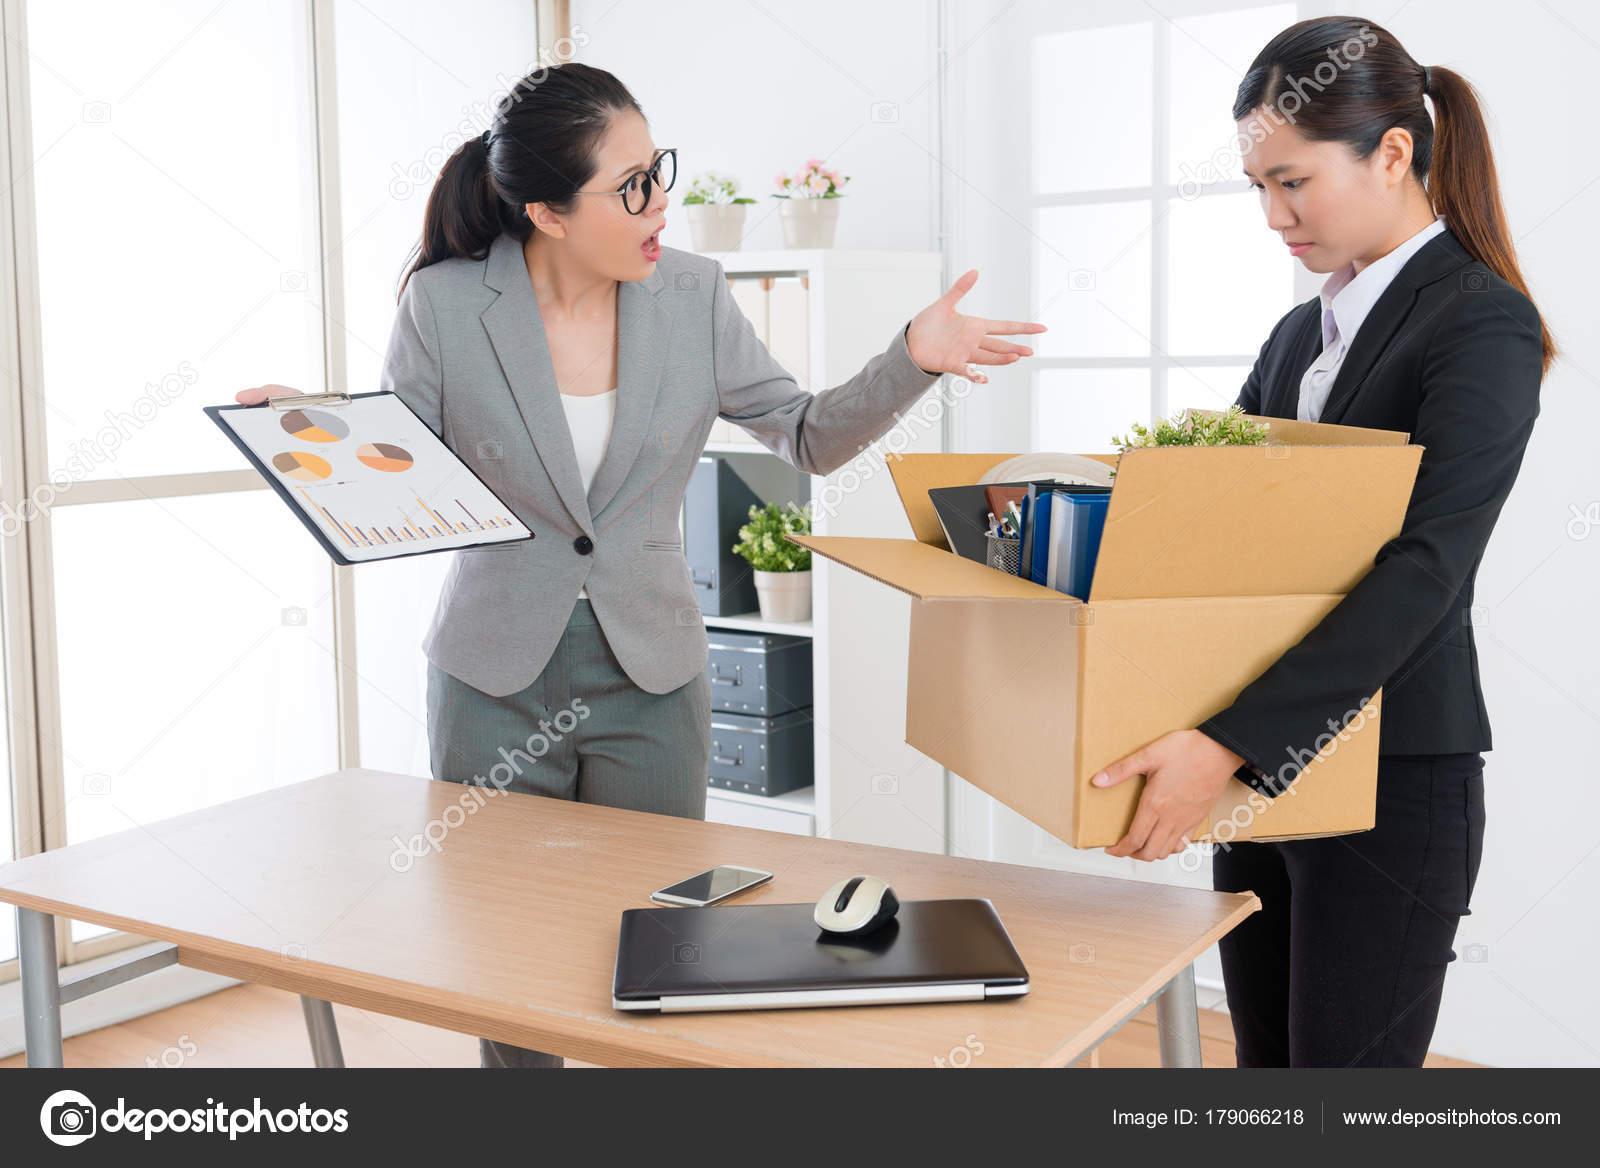 Employé de bureau de fille jeune beauté perte d emploi de l